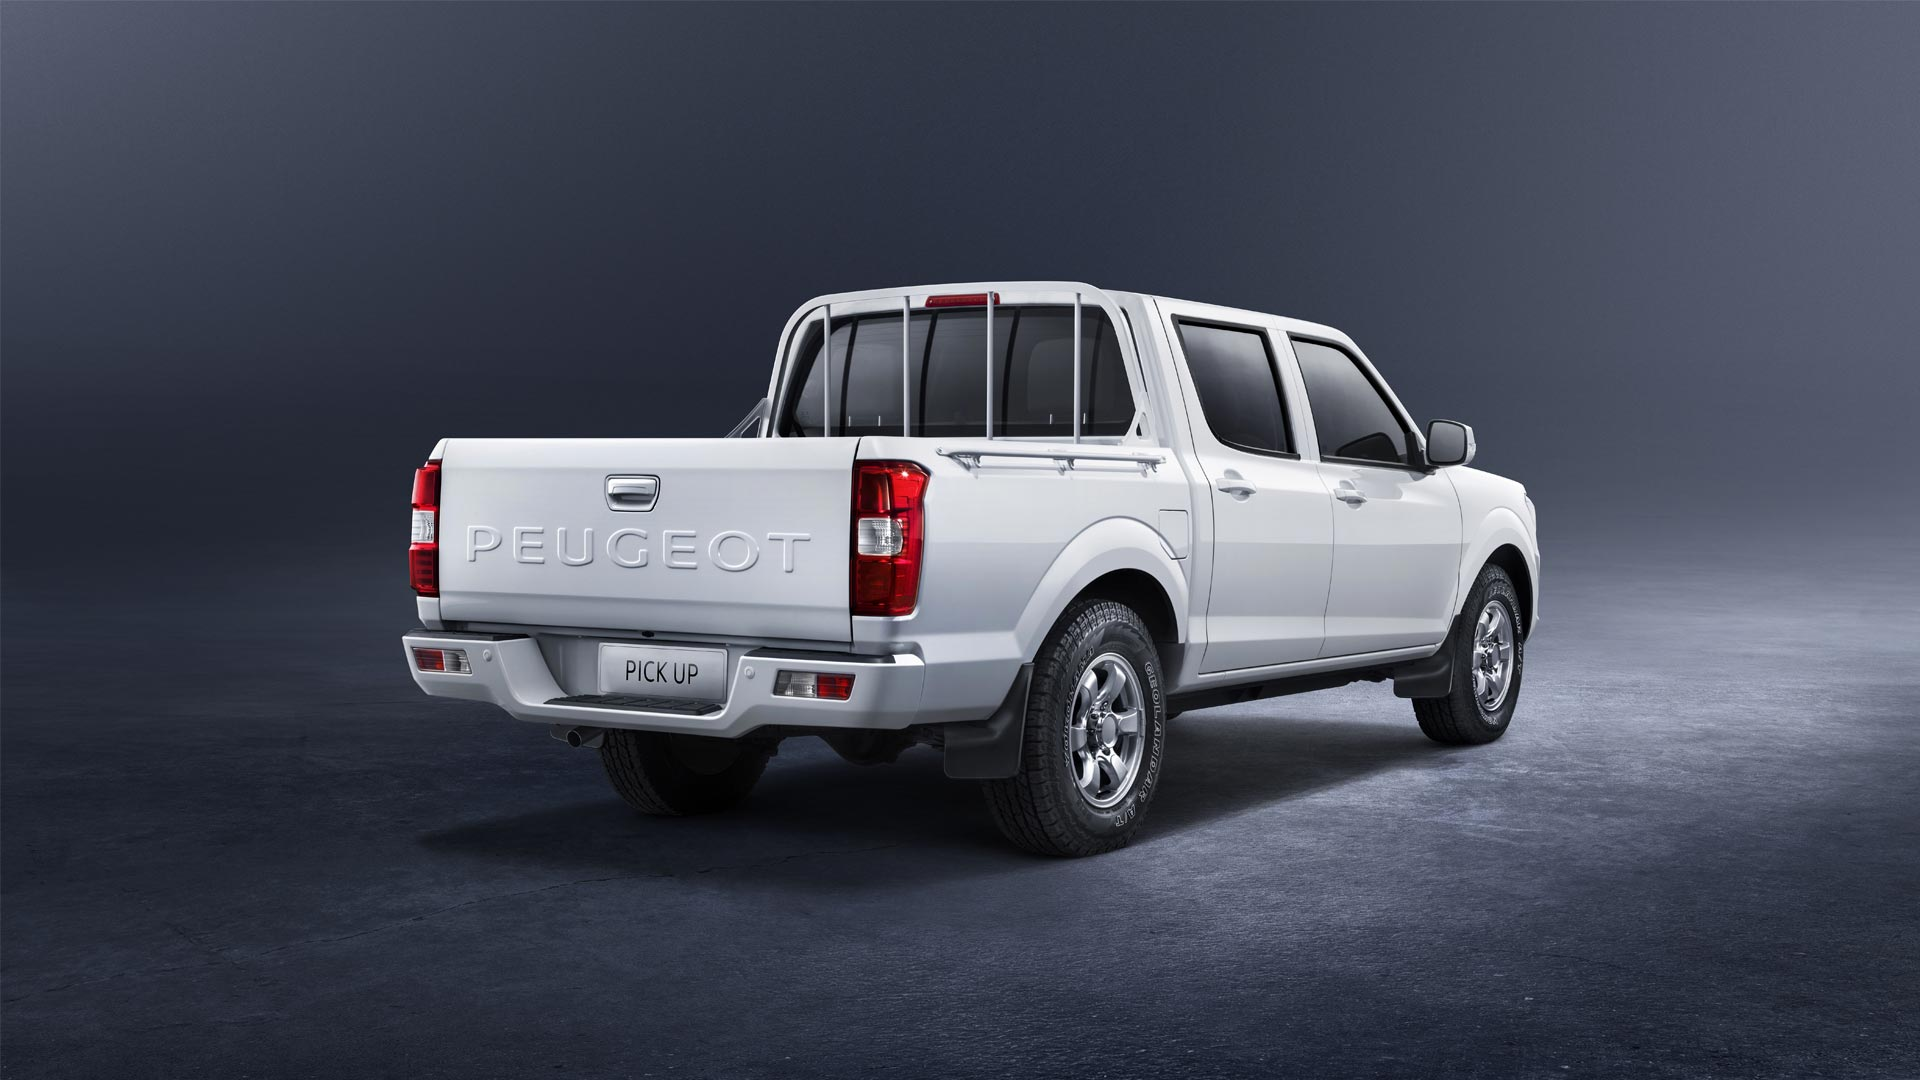 Peugeot-Pick-Up-2